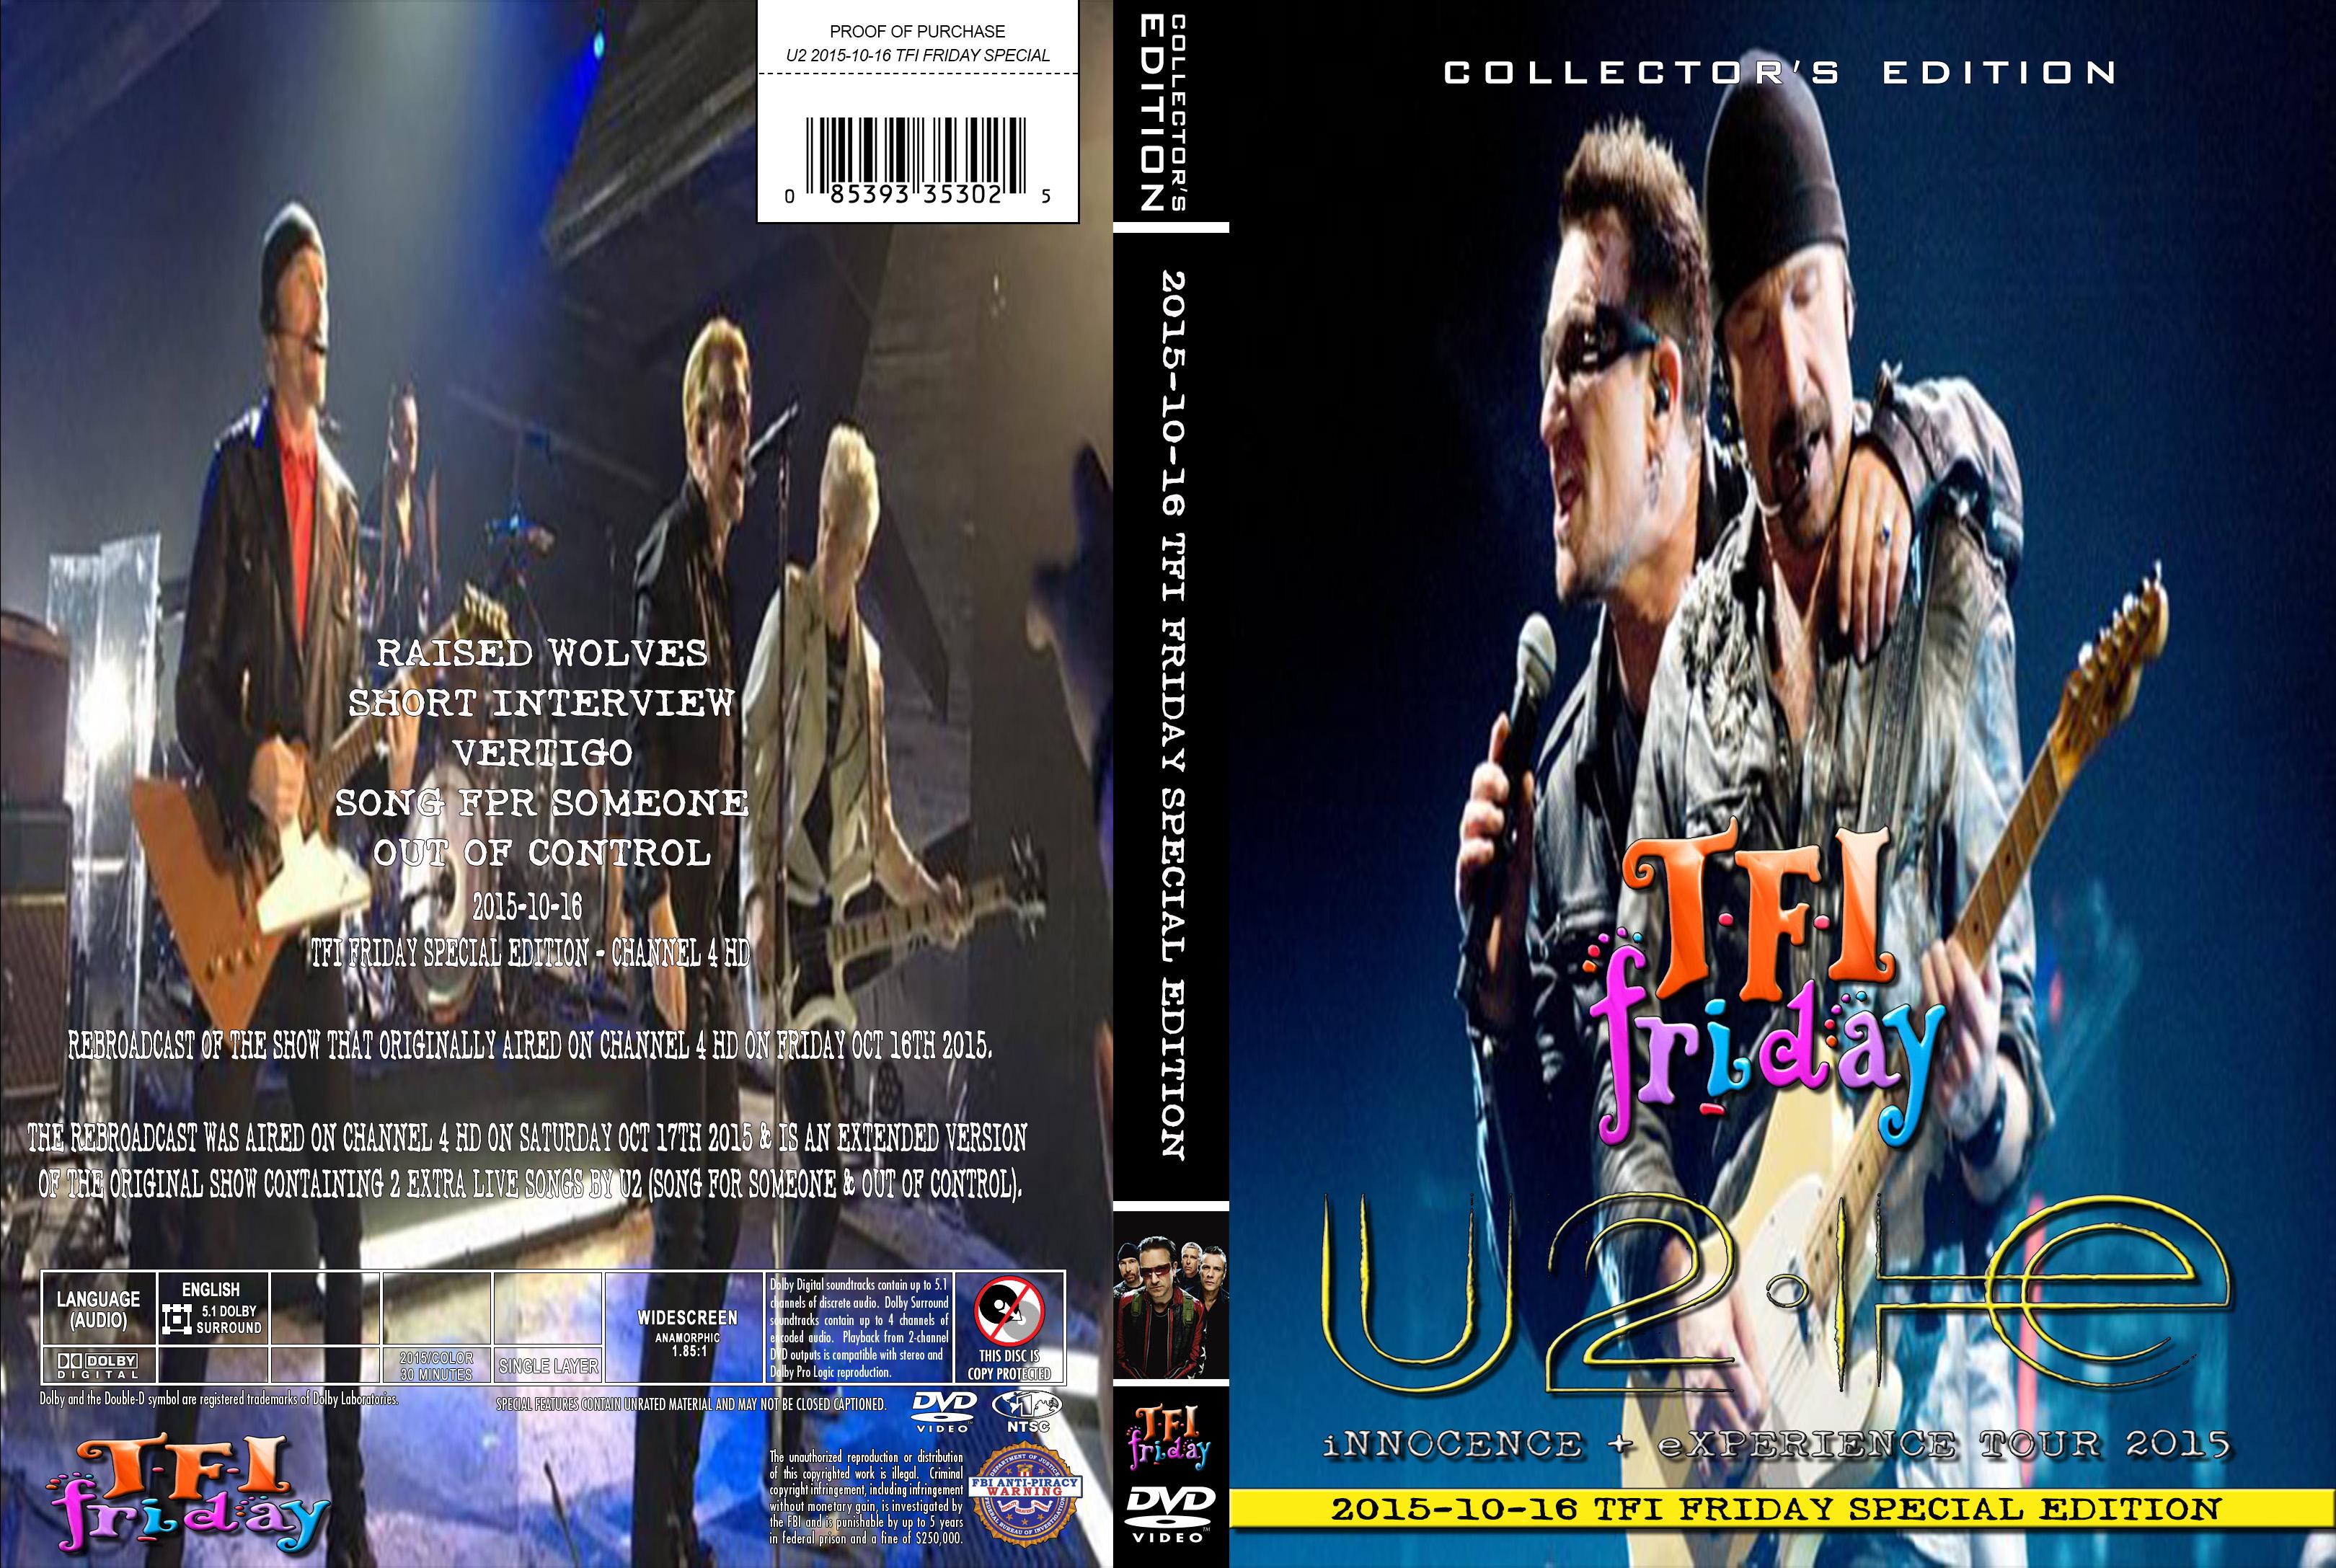 U2gigs com cover » Video » Blu-ray » 2012-2016 - Innocence